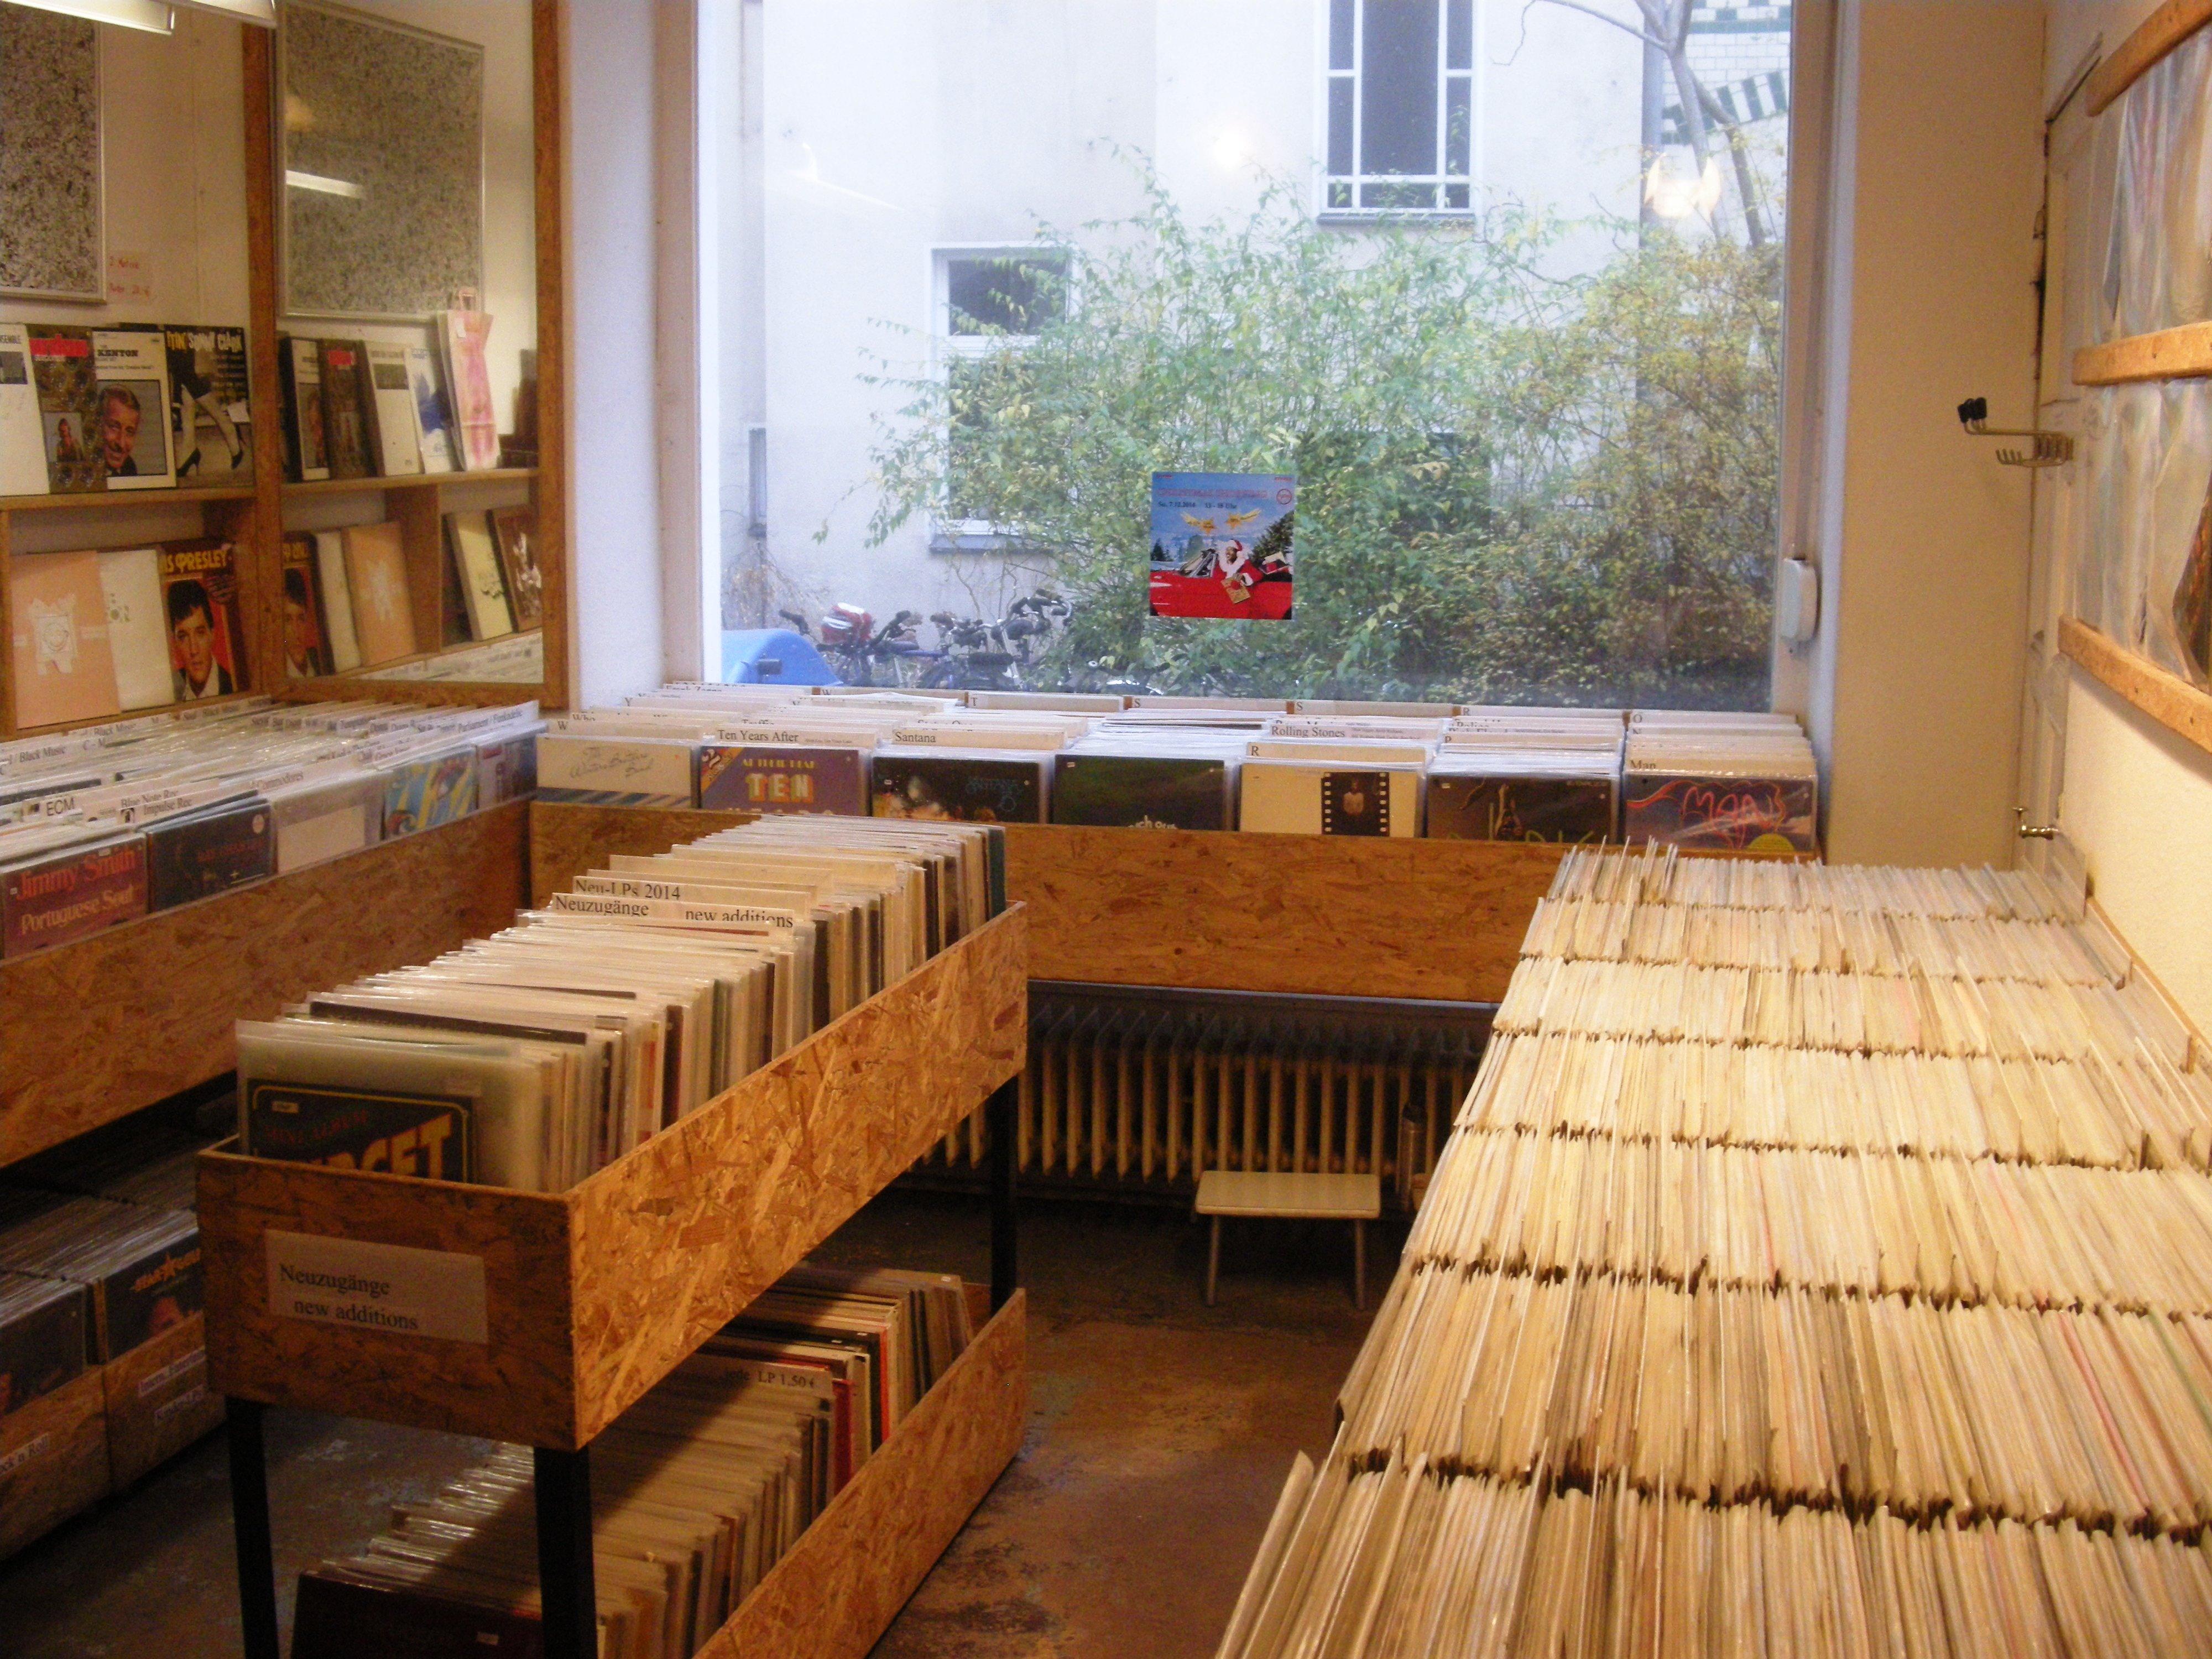 Berlin Recordshops Soul Safari